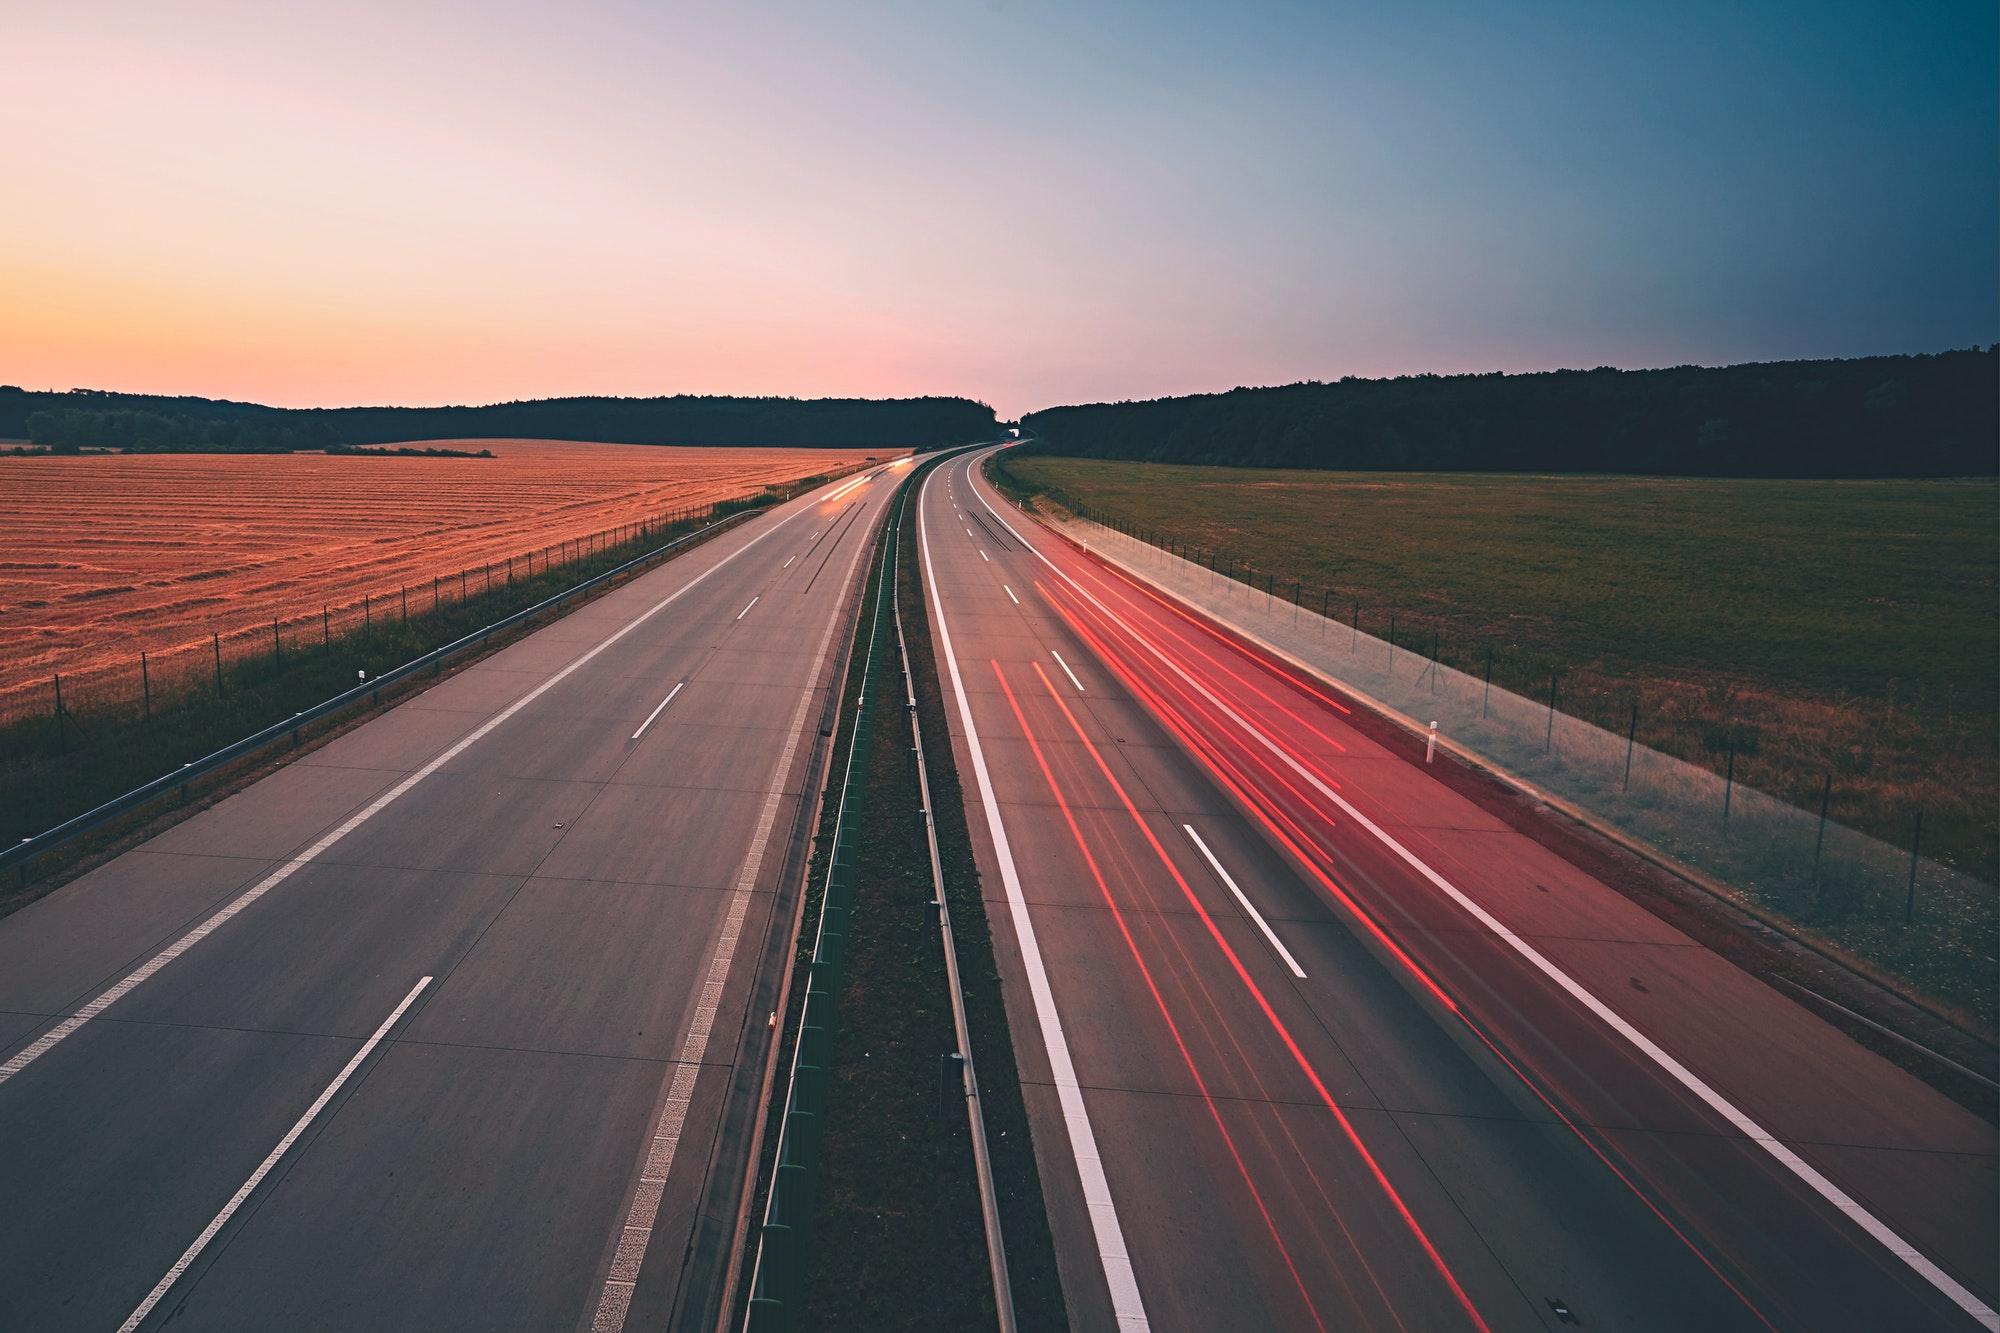 Besplatna cestarina na autocesti Zagreb-Sisak produljuje se do 31. ožujka